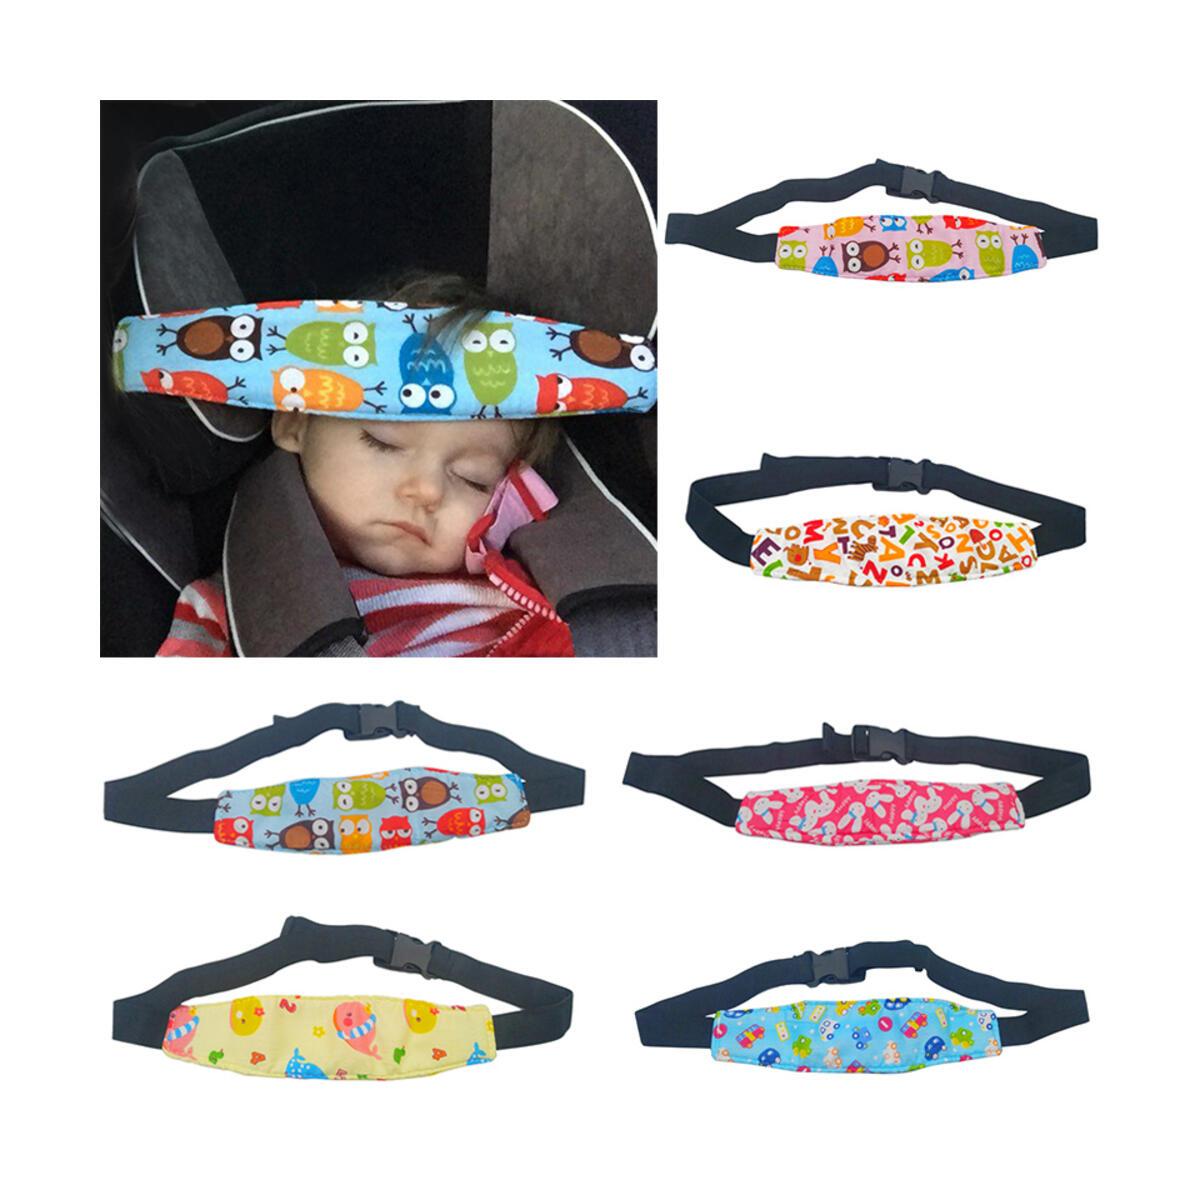 Infant Baby Car Seat Head Support Children Belt Fastening Belt Adjustable Playpens Sleep Positioner Baby Safety Pillows